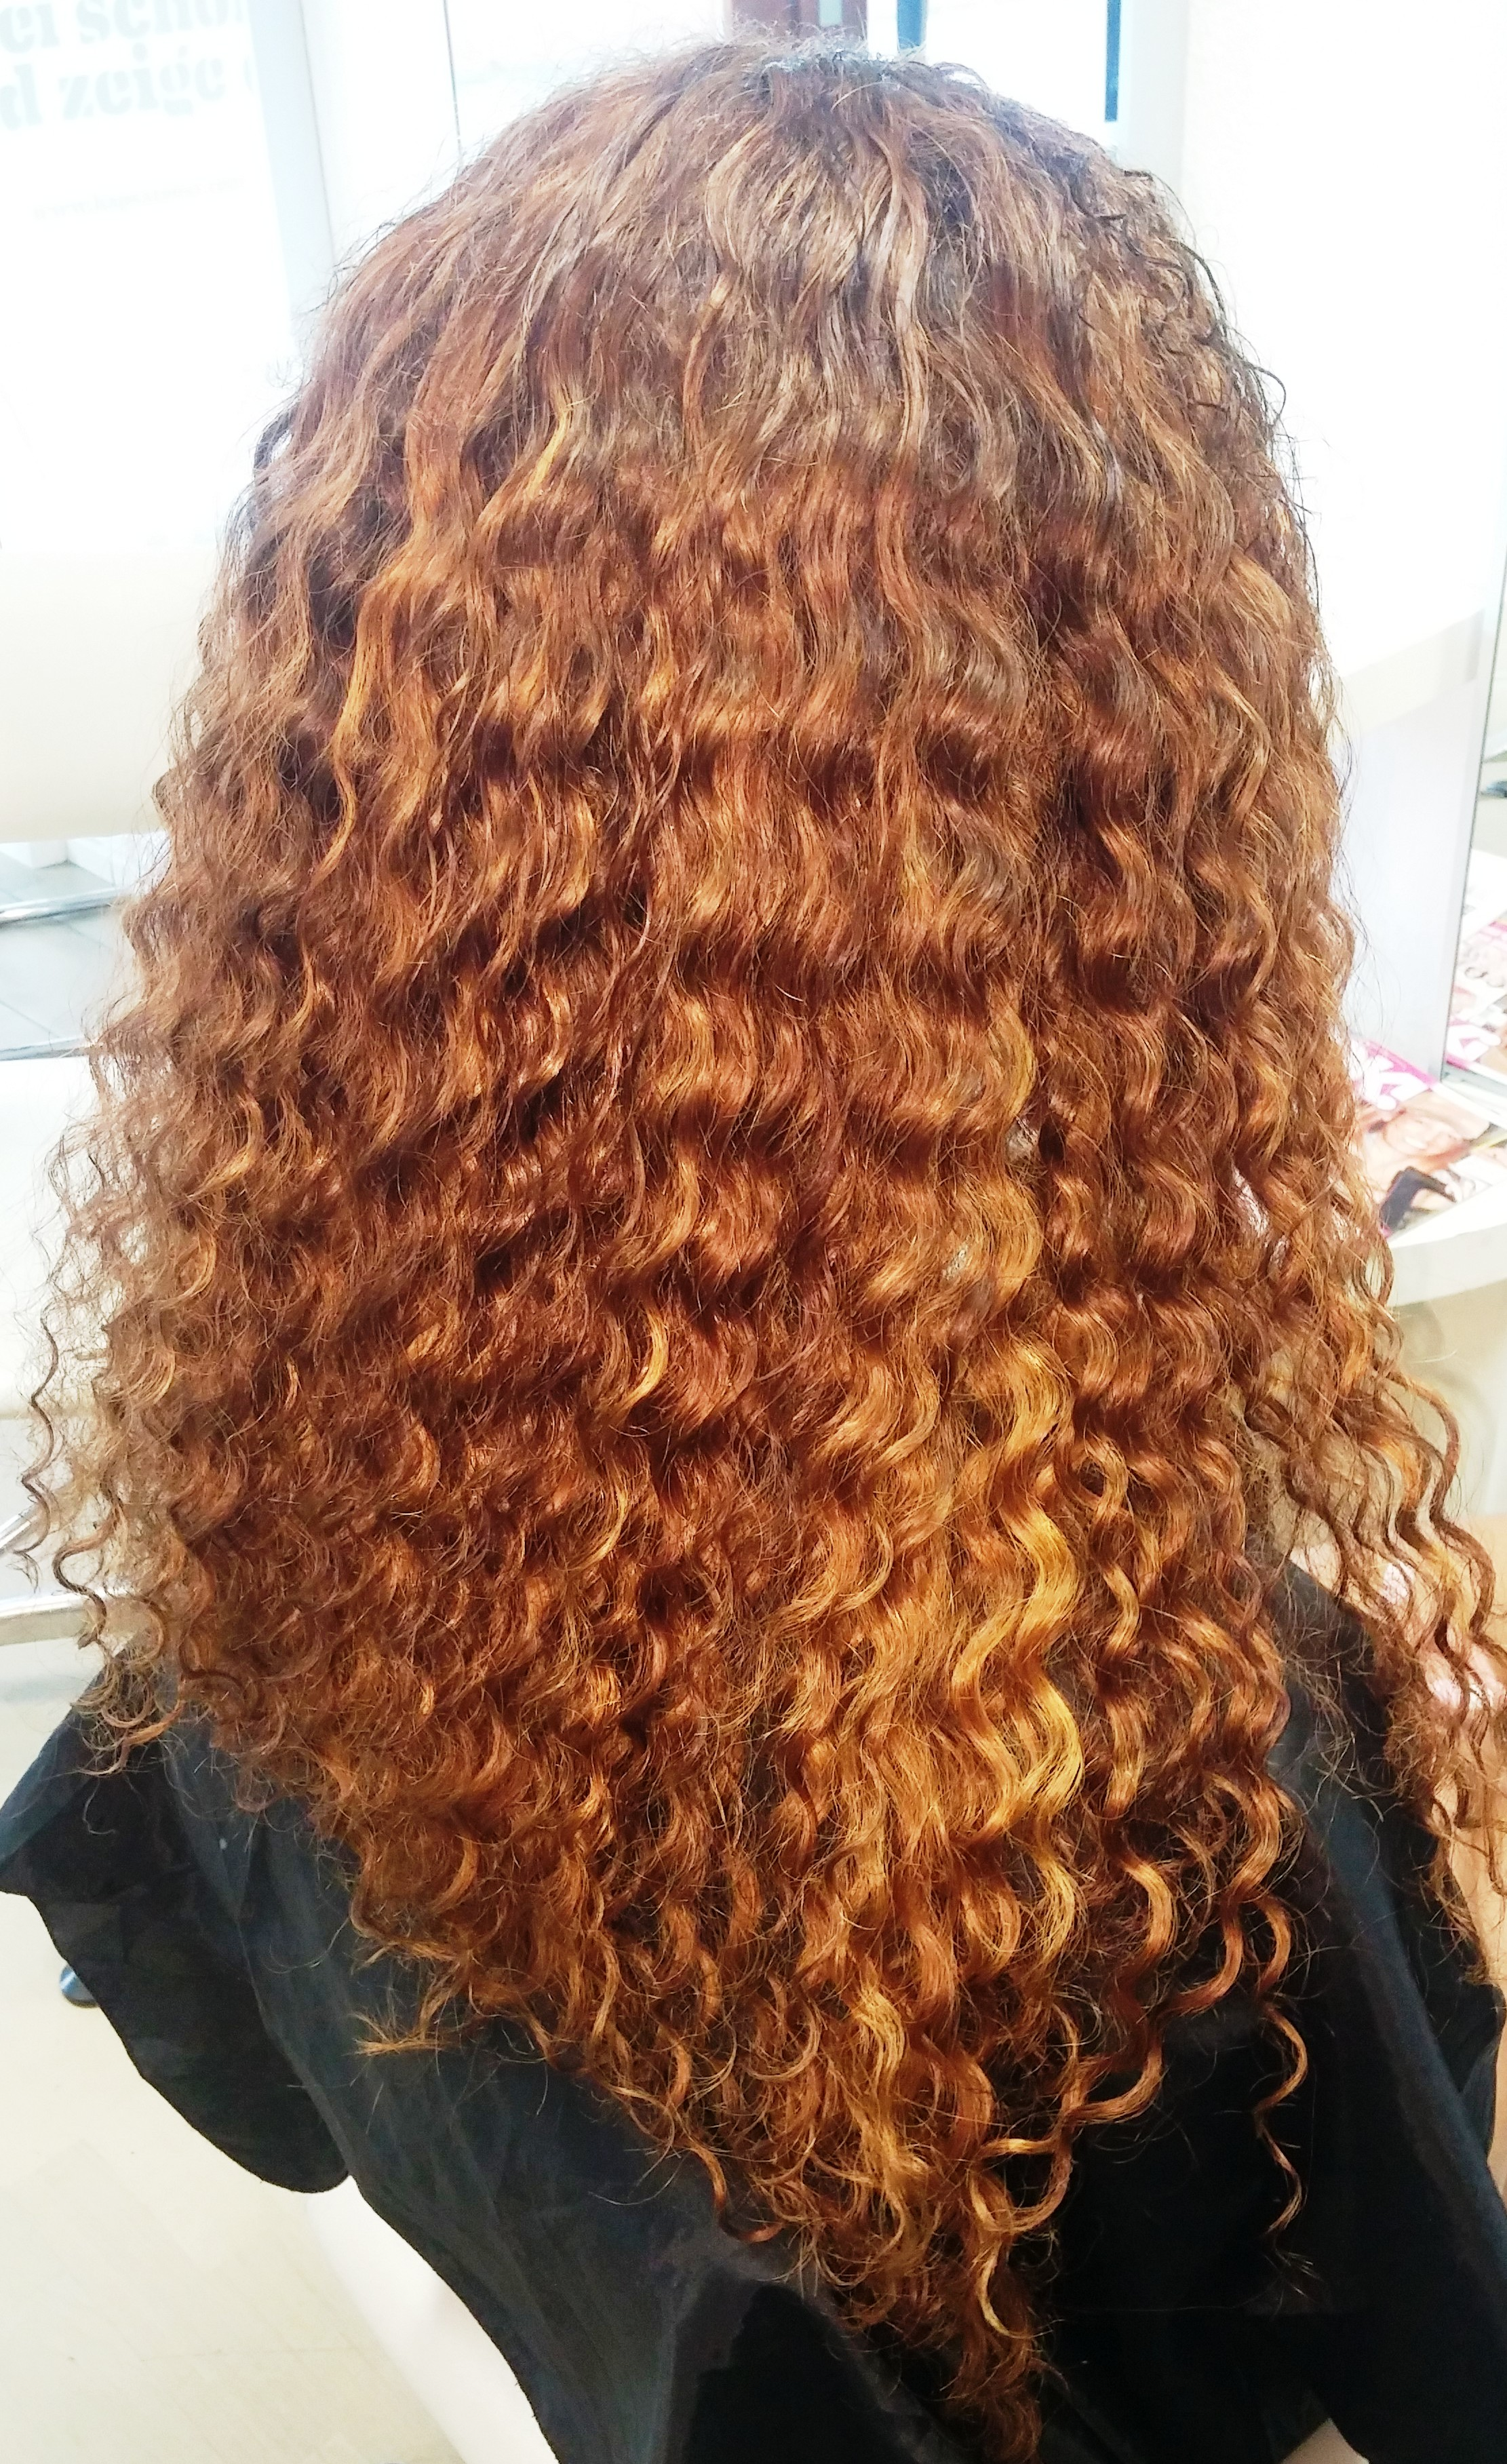 Haarverlängerung Archives Afroshop Berlin Coura Care Beauty Concept